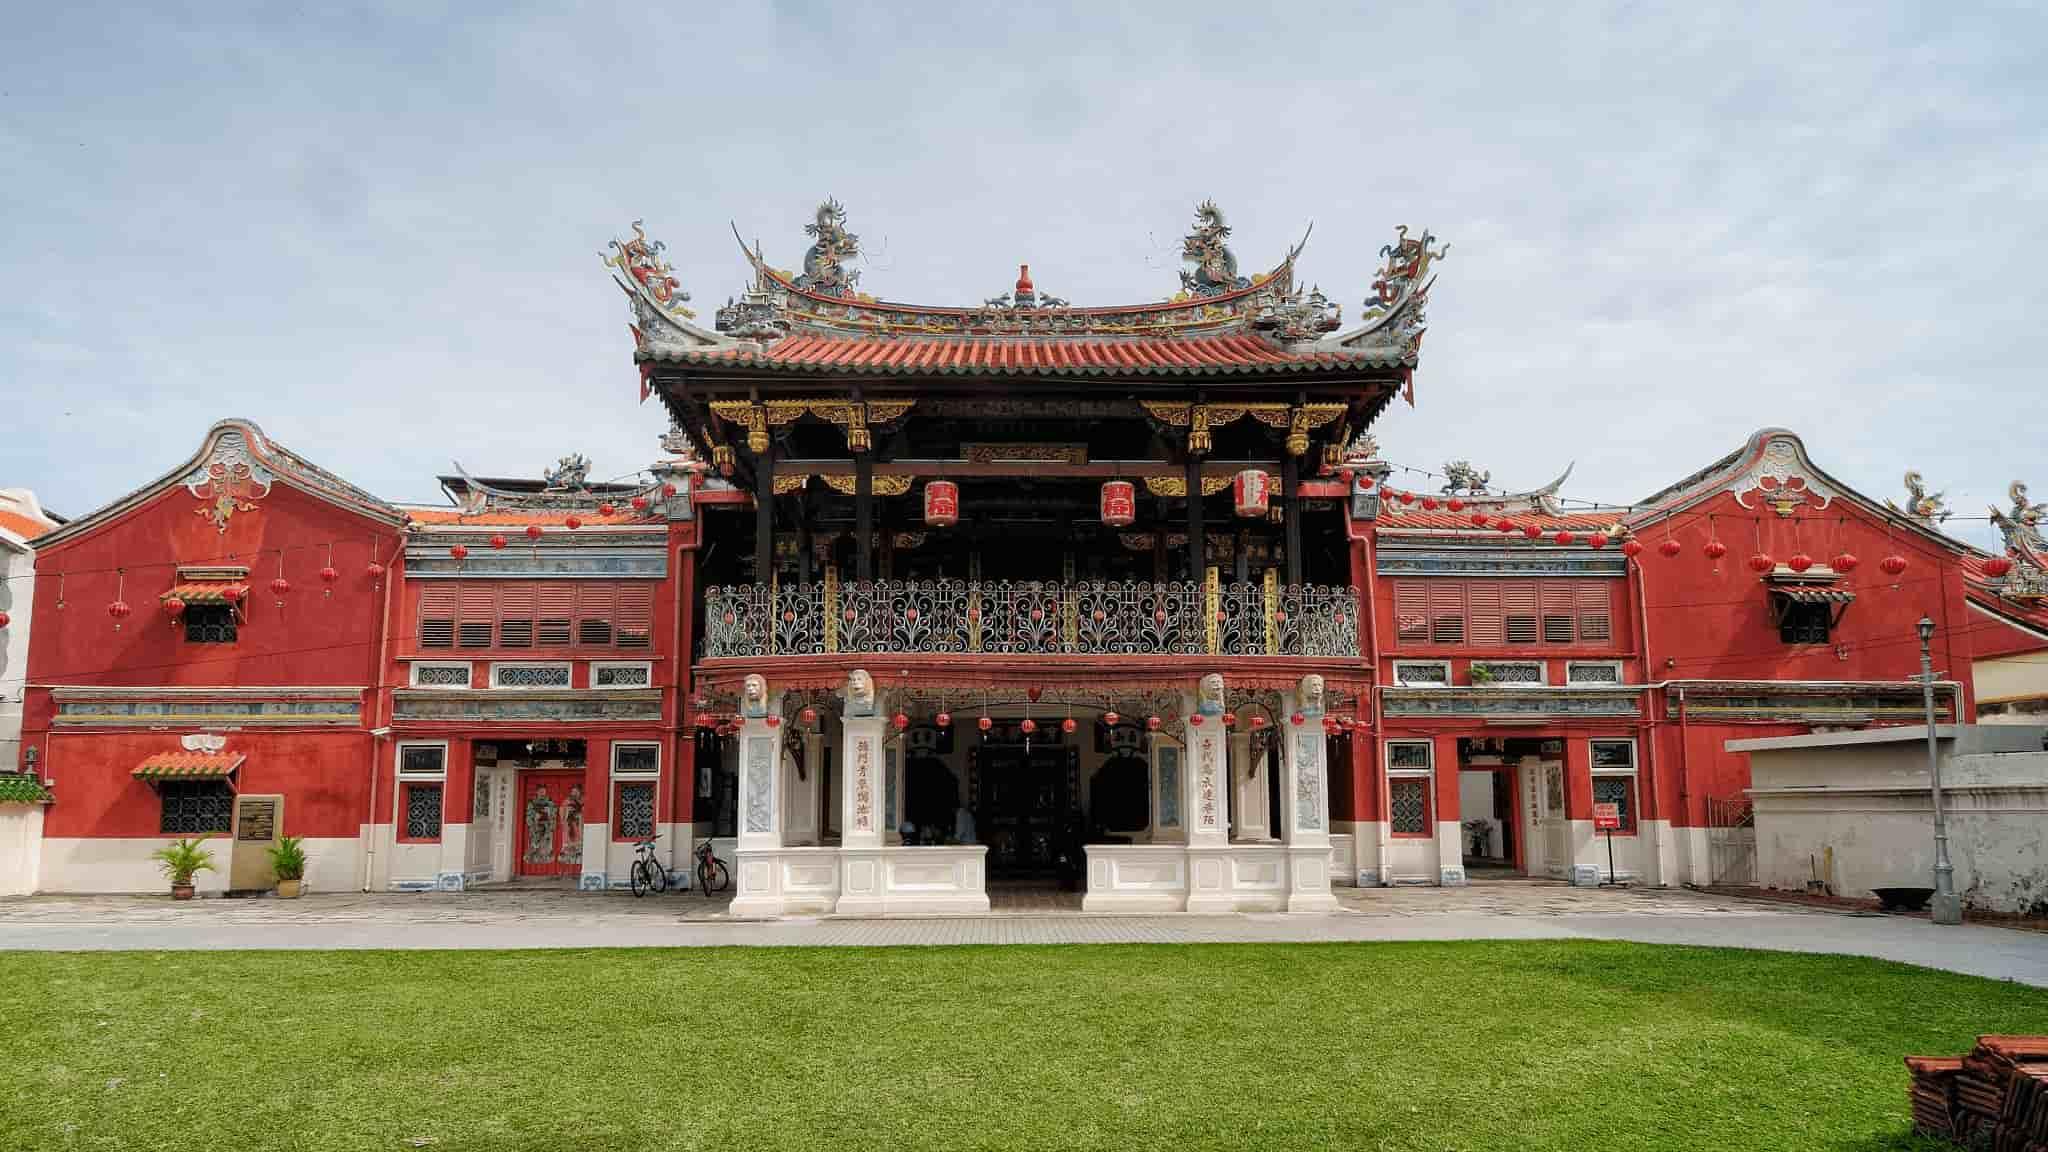 Cheah Kongsi, Chinese Temple in Penang